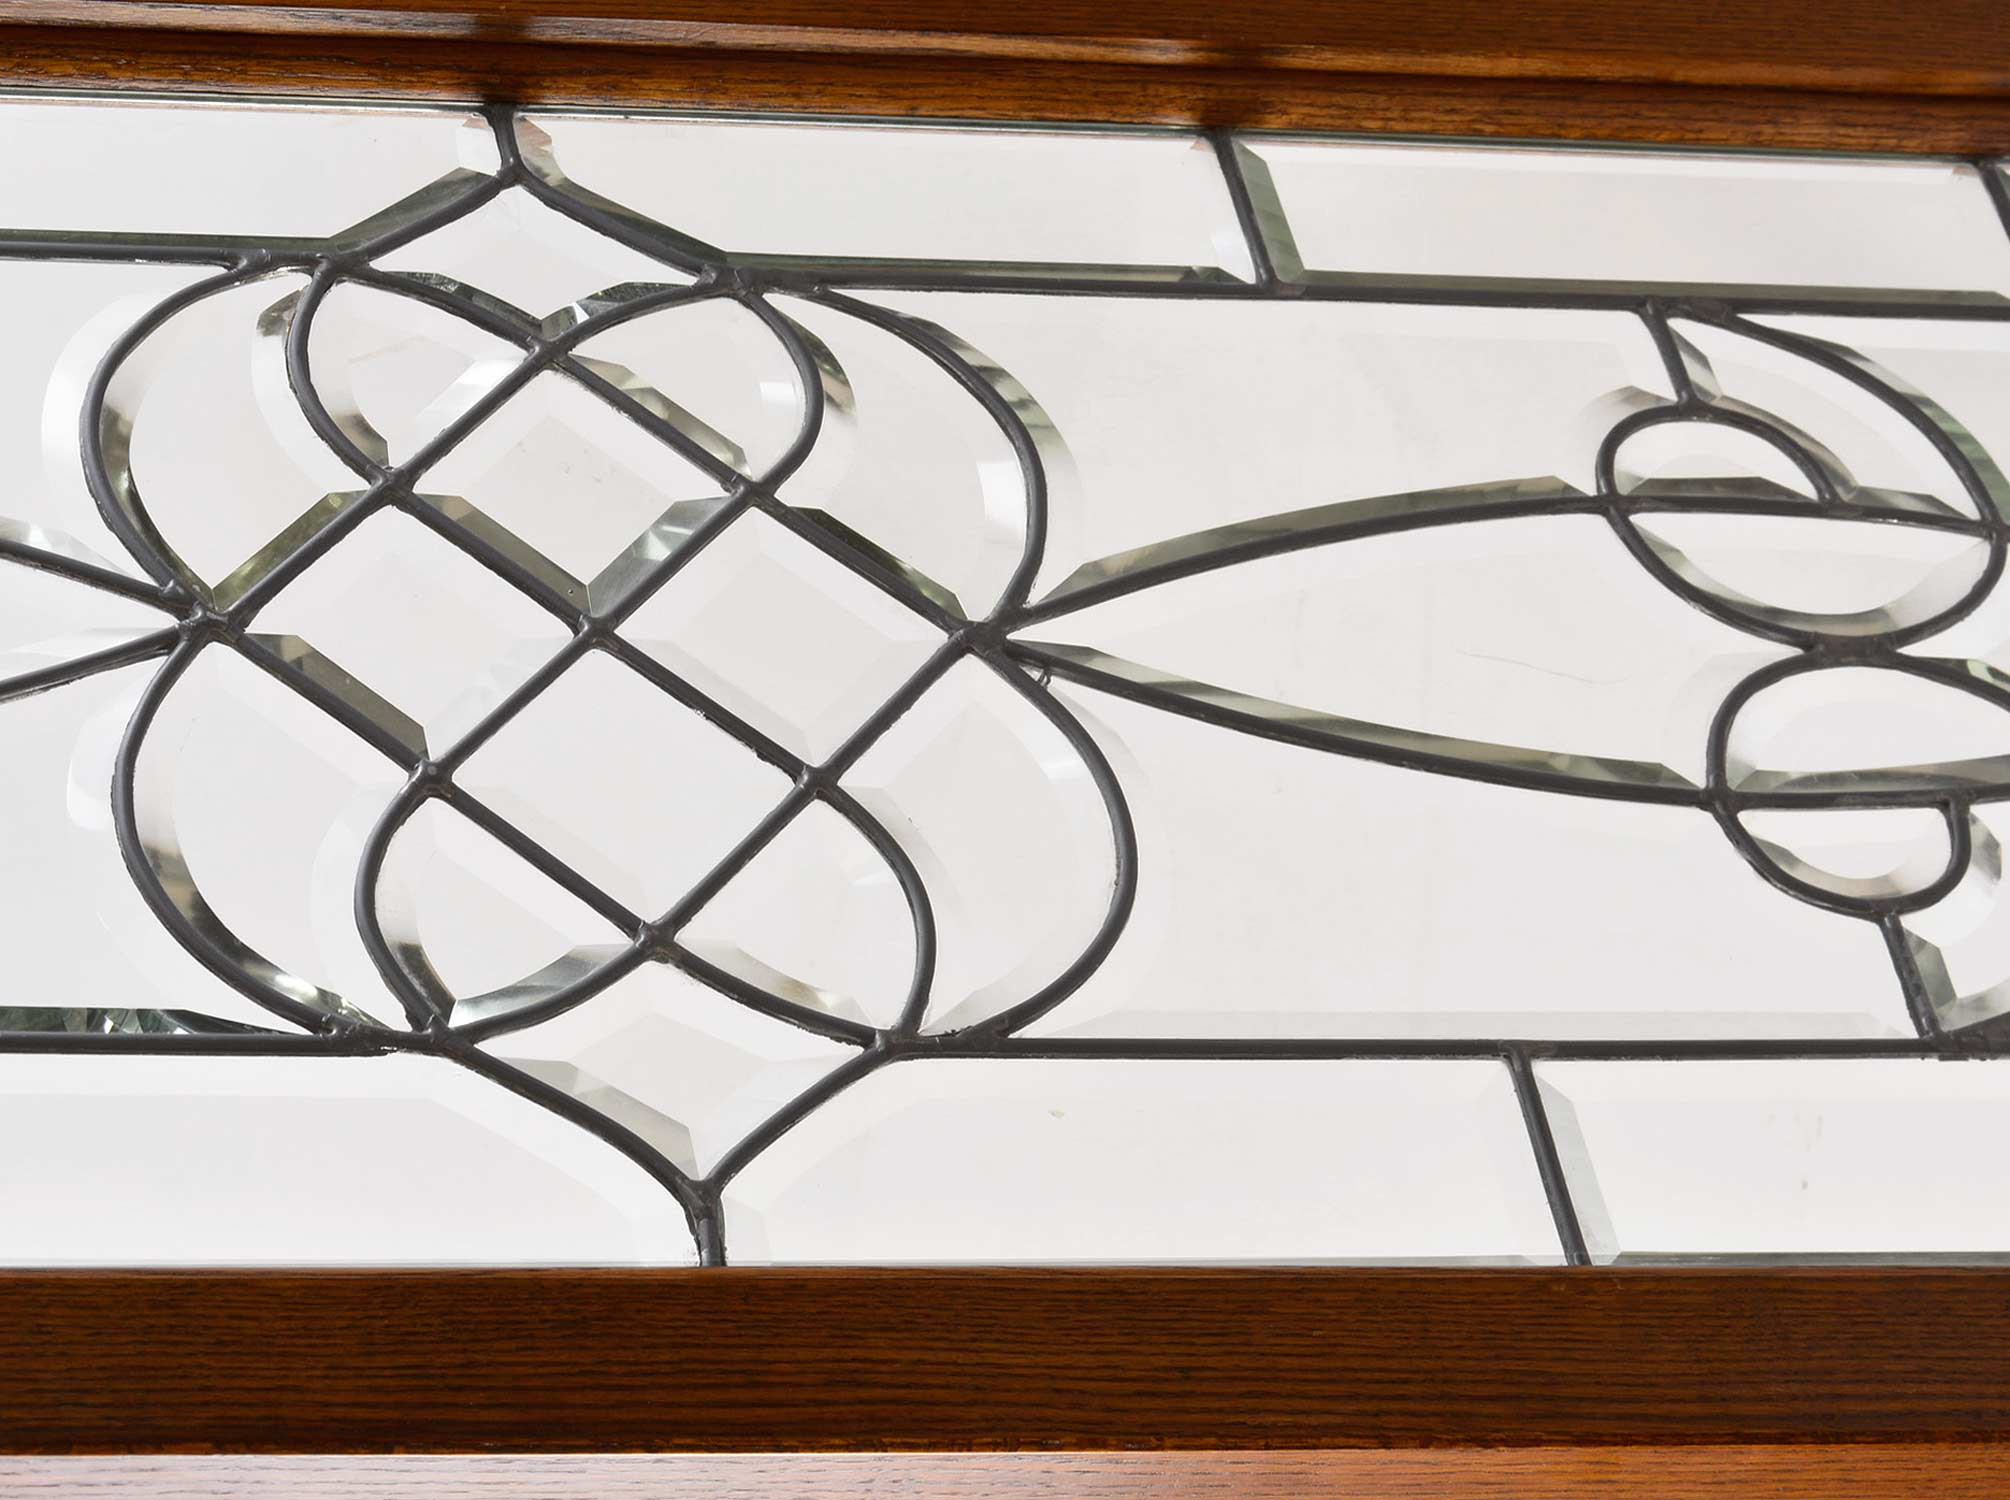 46387-beveled-scroll-window-middle-detail.jpg